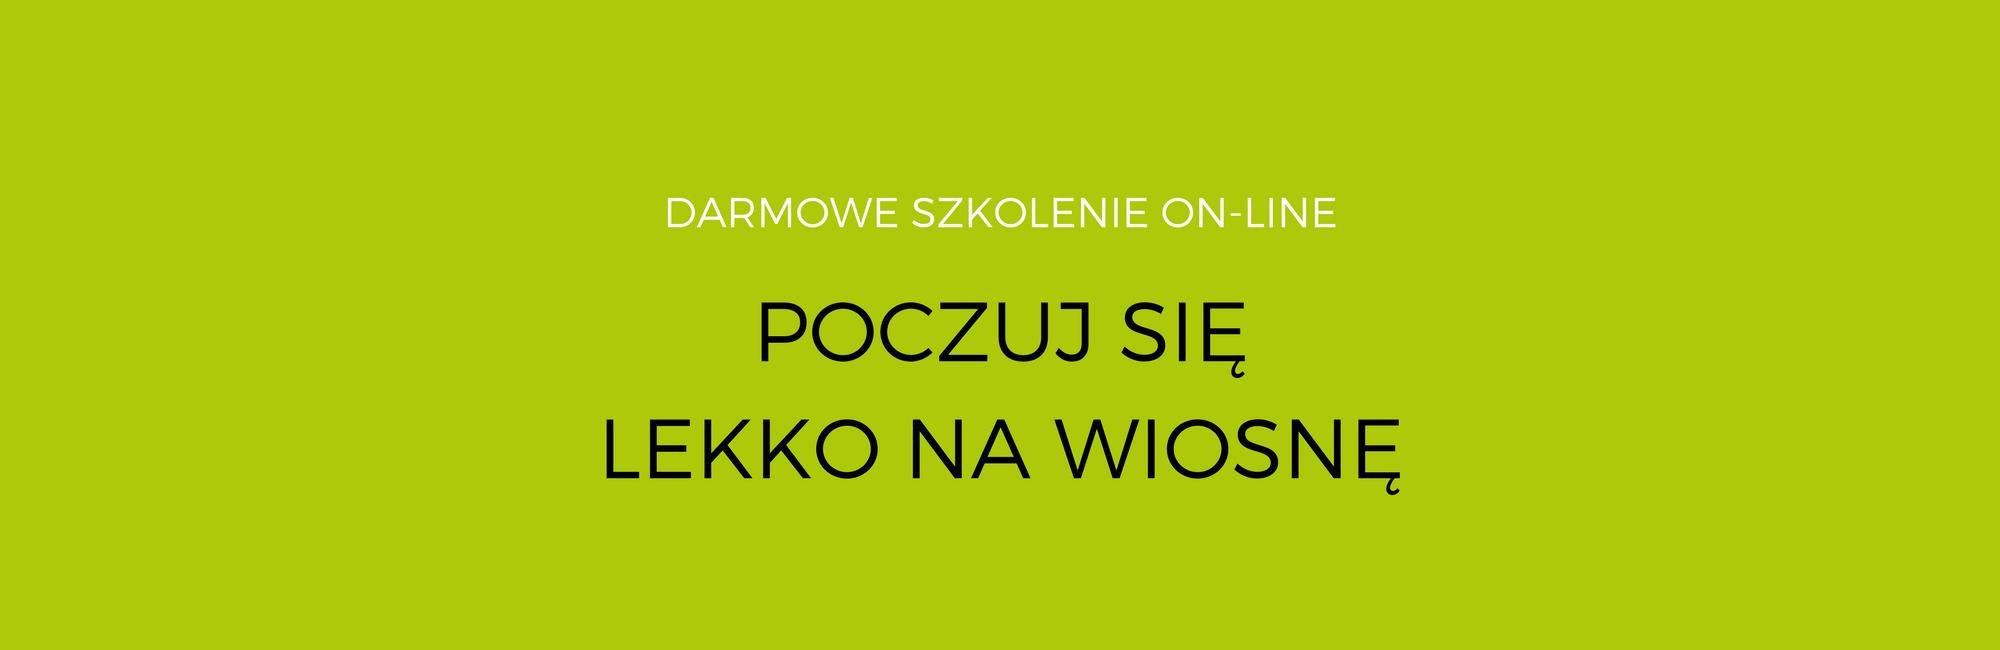 fitStrategia_poczuj_sie_lekko_na_wiosne